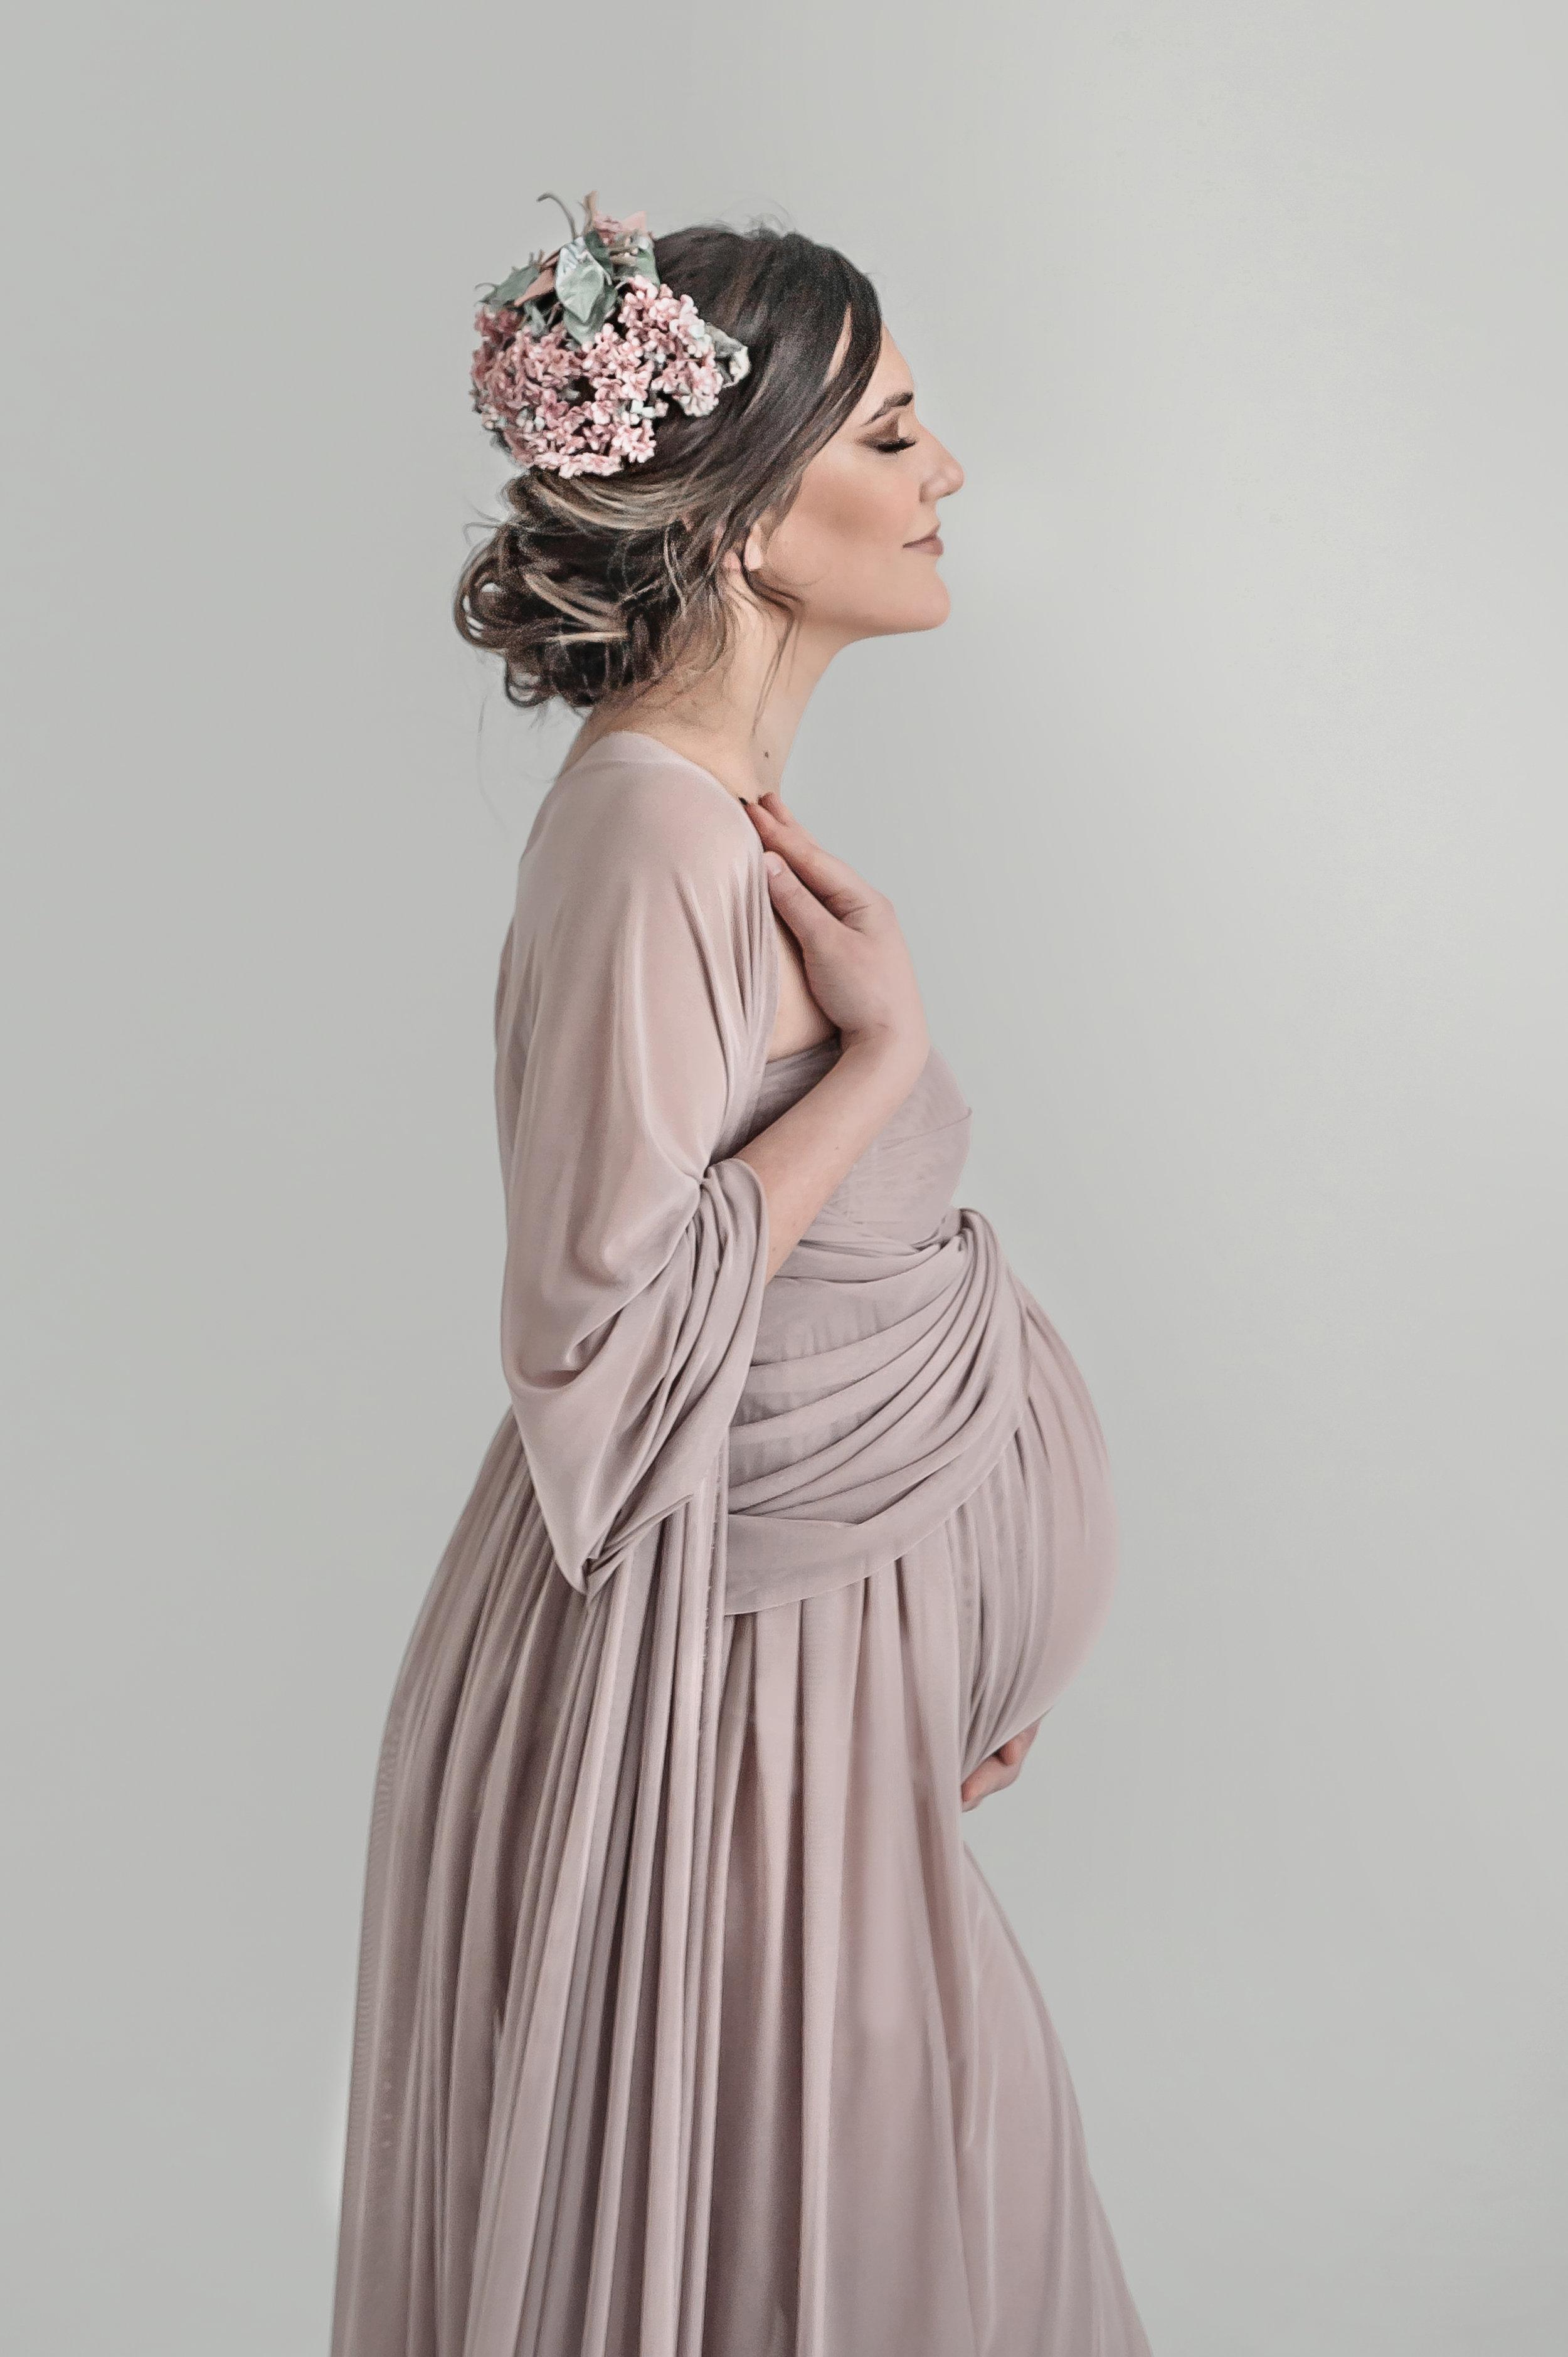 classic-maternity-portrait-boston-majpg.jpg